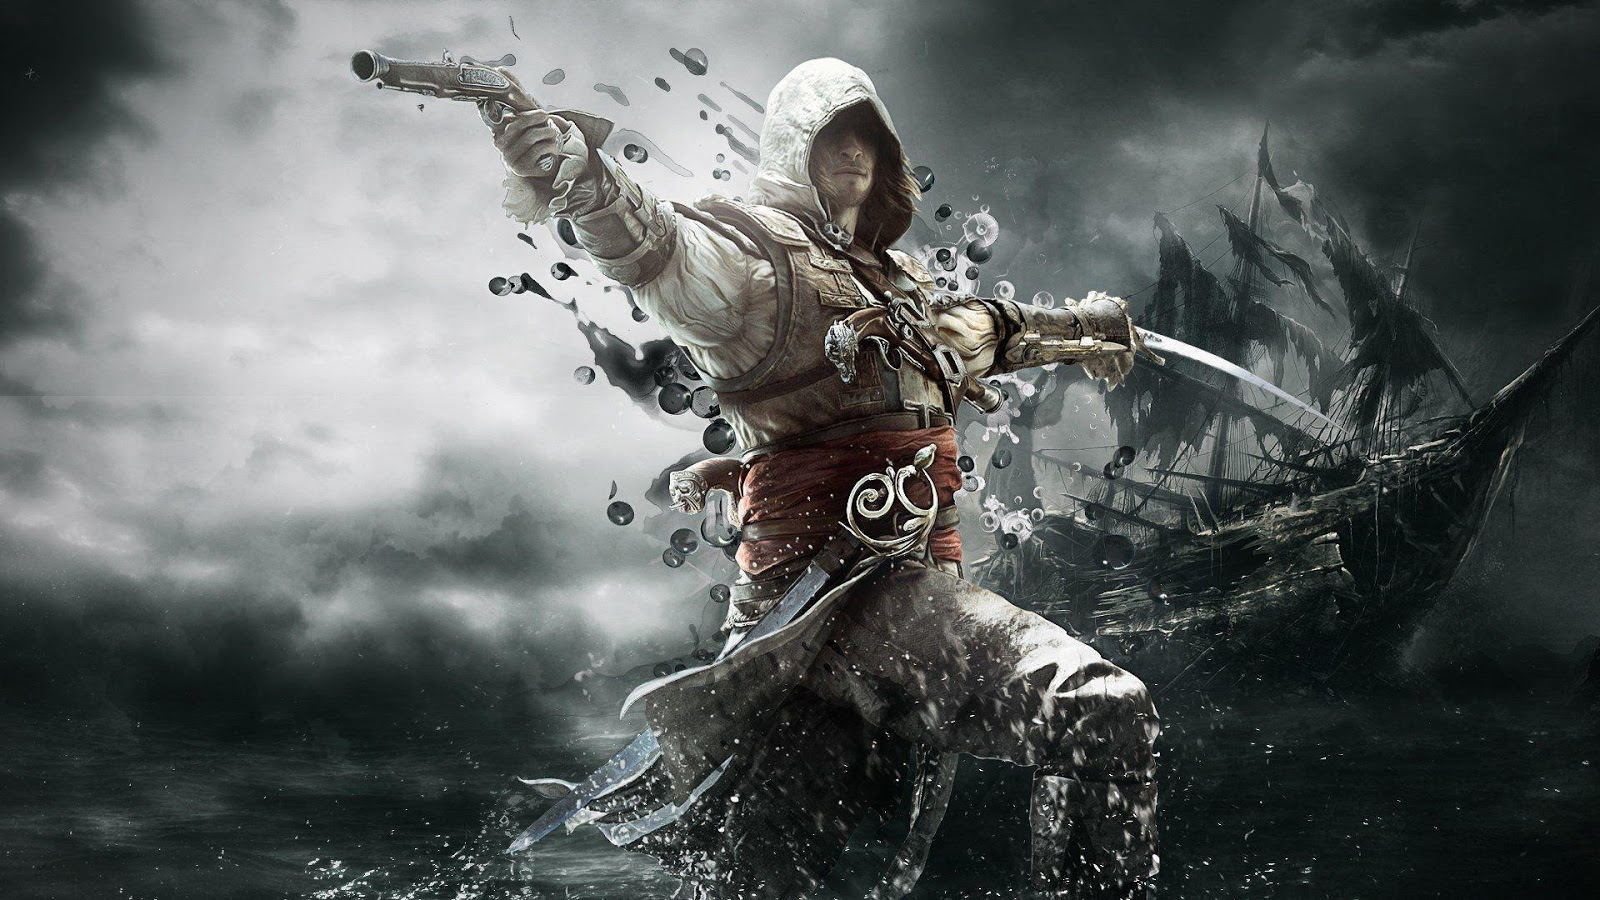 Assassin's Creed 8k  أساسنز كريد ,Assassin's Creed 8k , أساسنز كريد ,Assassin's Creed, أساسنز كريد, Wallpapers,Wallpapers Assassin's Creed 8k, خلفيات العاب, 8K خلفيات, 8K,